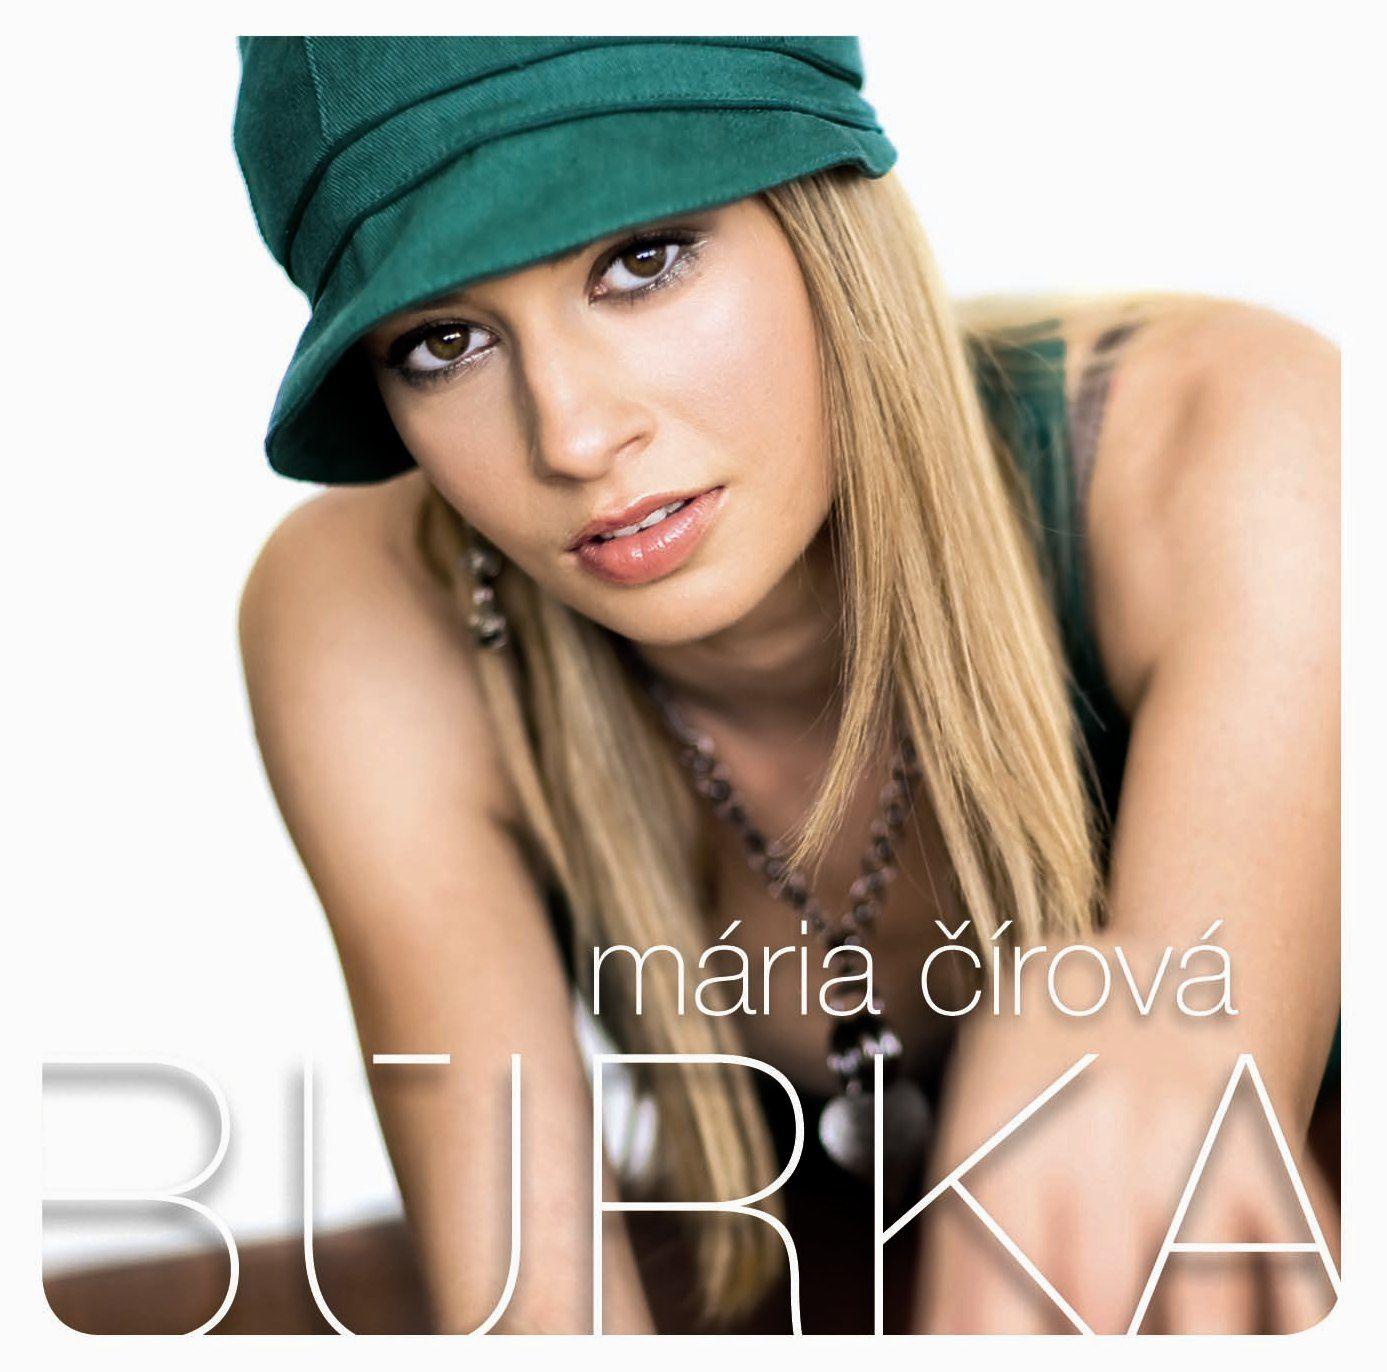 Mária Čírová - CD Búrka